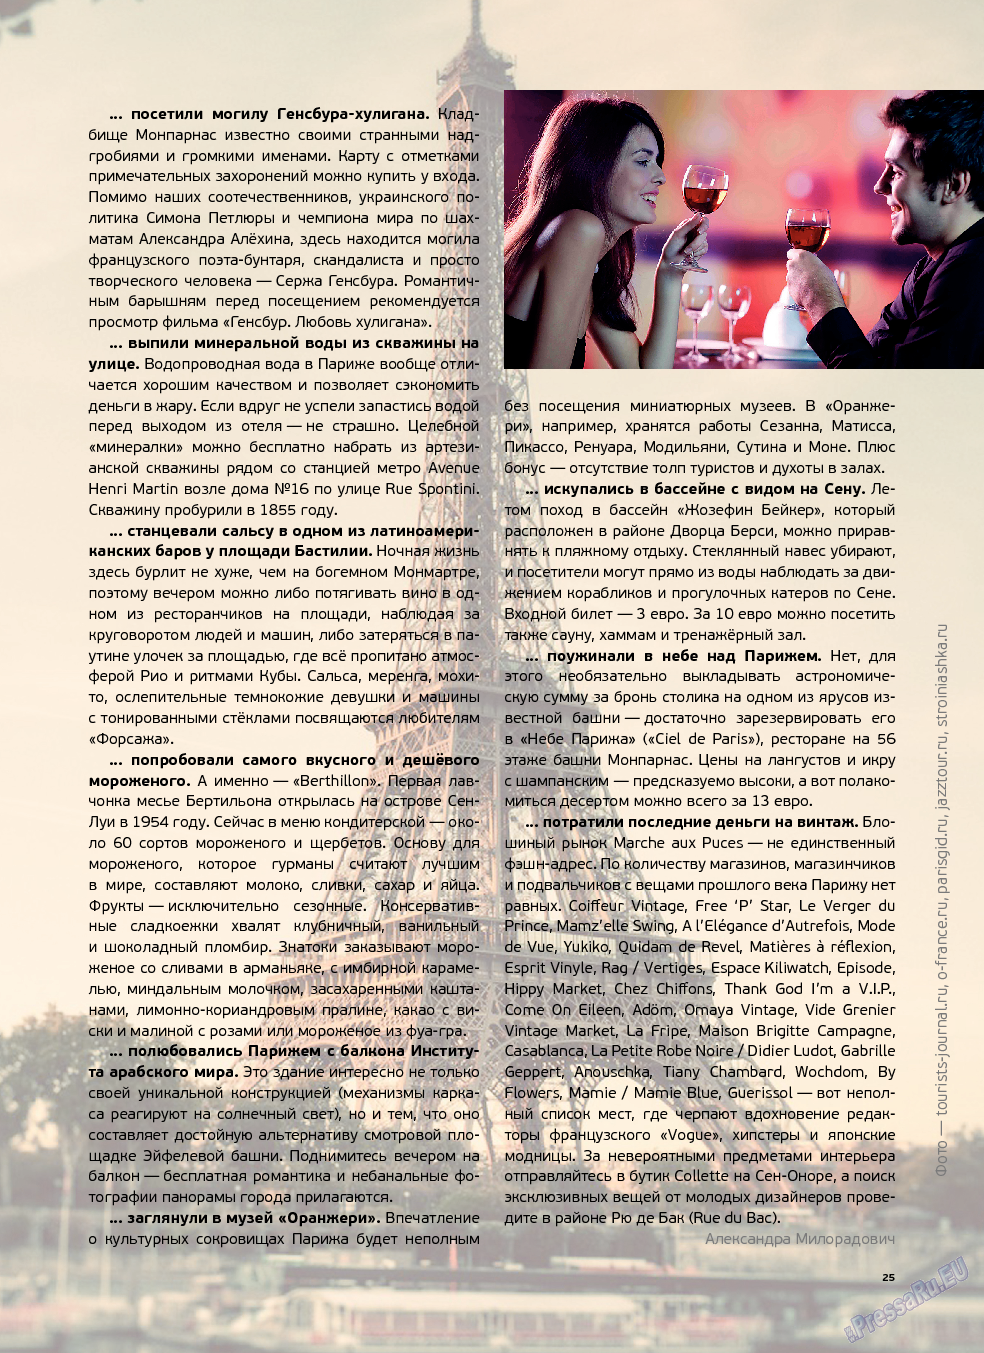 Артек (журнал). 2013 год, номер 3, стр. 27